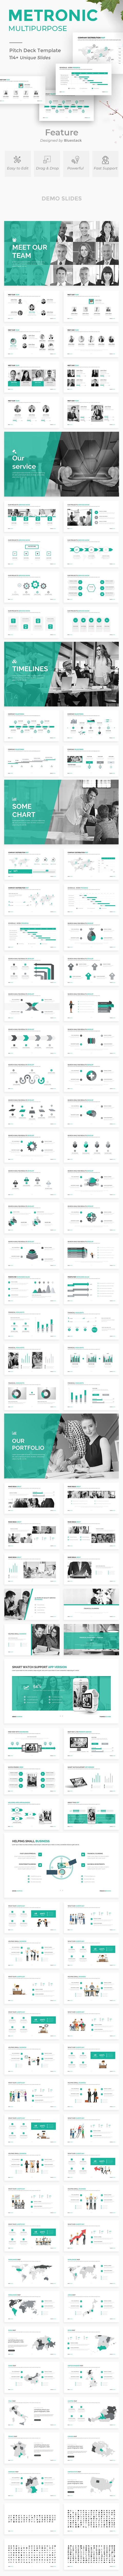 Metronic Business Proposal Google Slide Template - Google Slides Presentation Templates